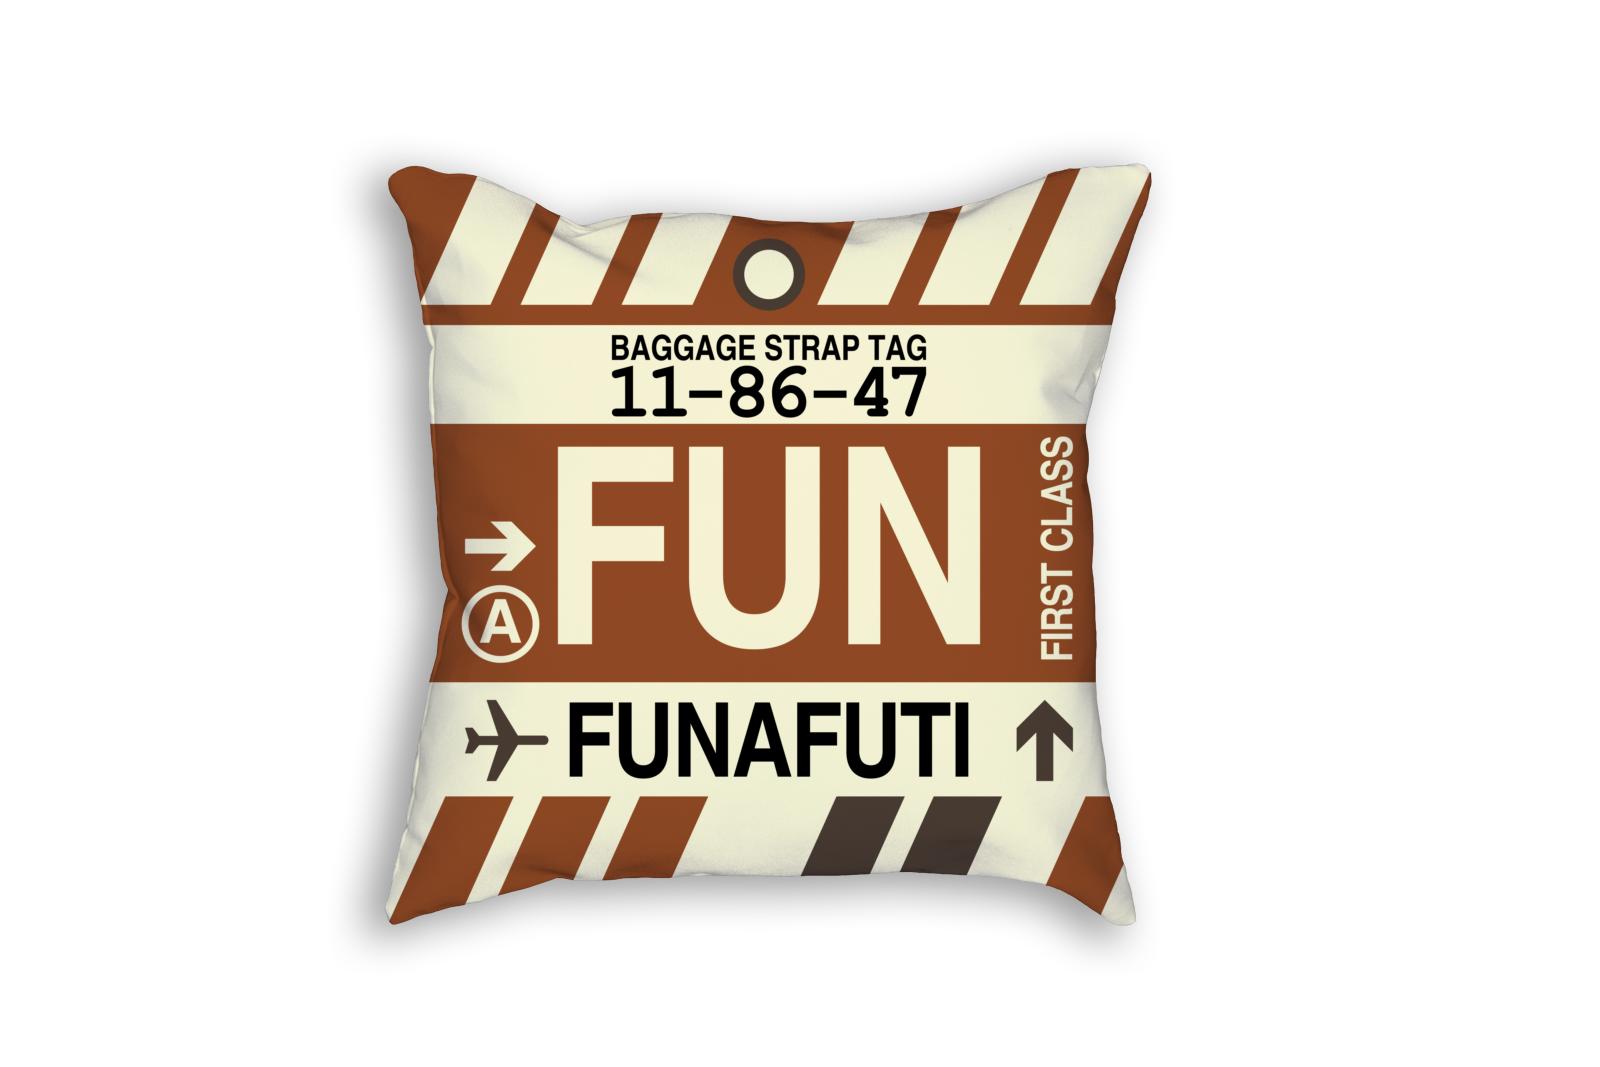 Fun Funafuti Throw Pillow Airport Code Amp Vintage Baggage